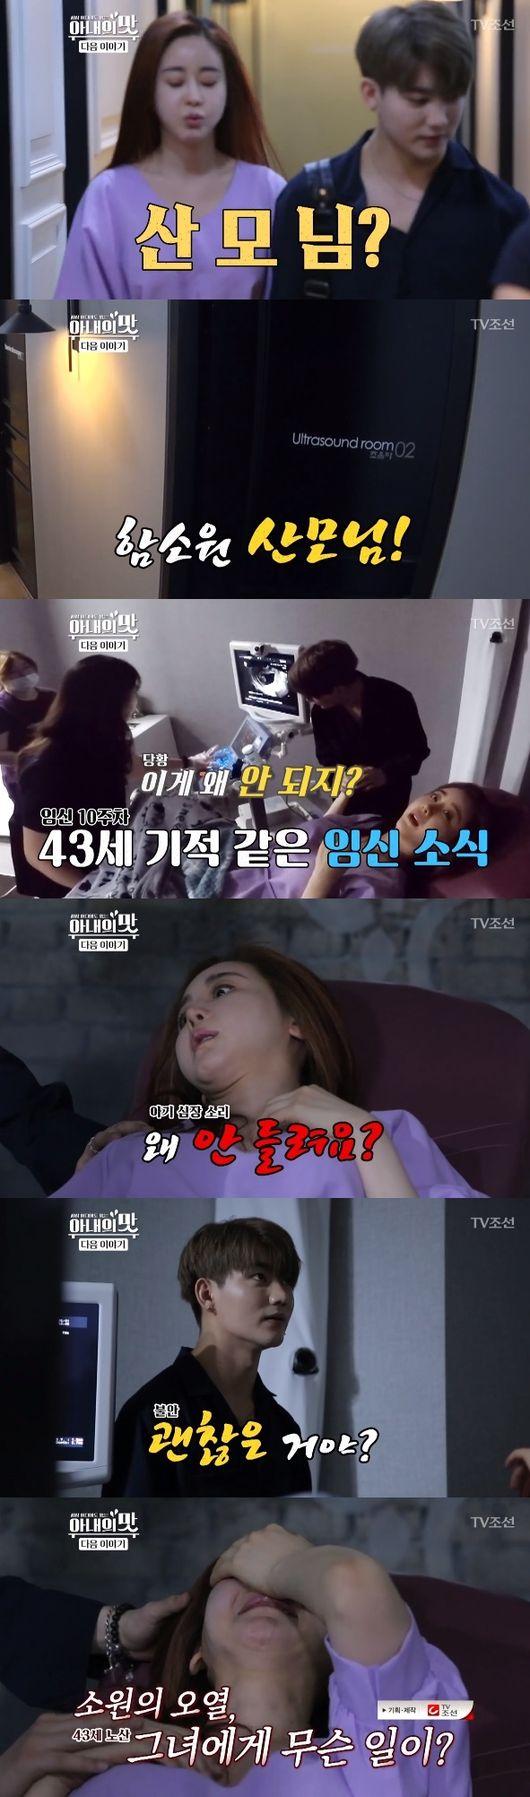 "[Oh!쎈 레터] ""시청자 질타""..'아내의맛', 43살 함소원 임신 낚시 편집 '뭇매'"